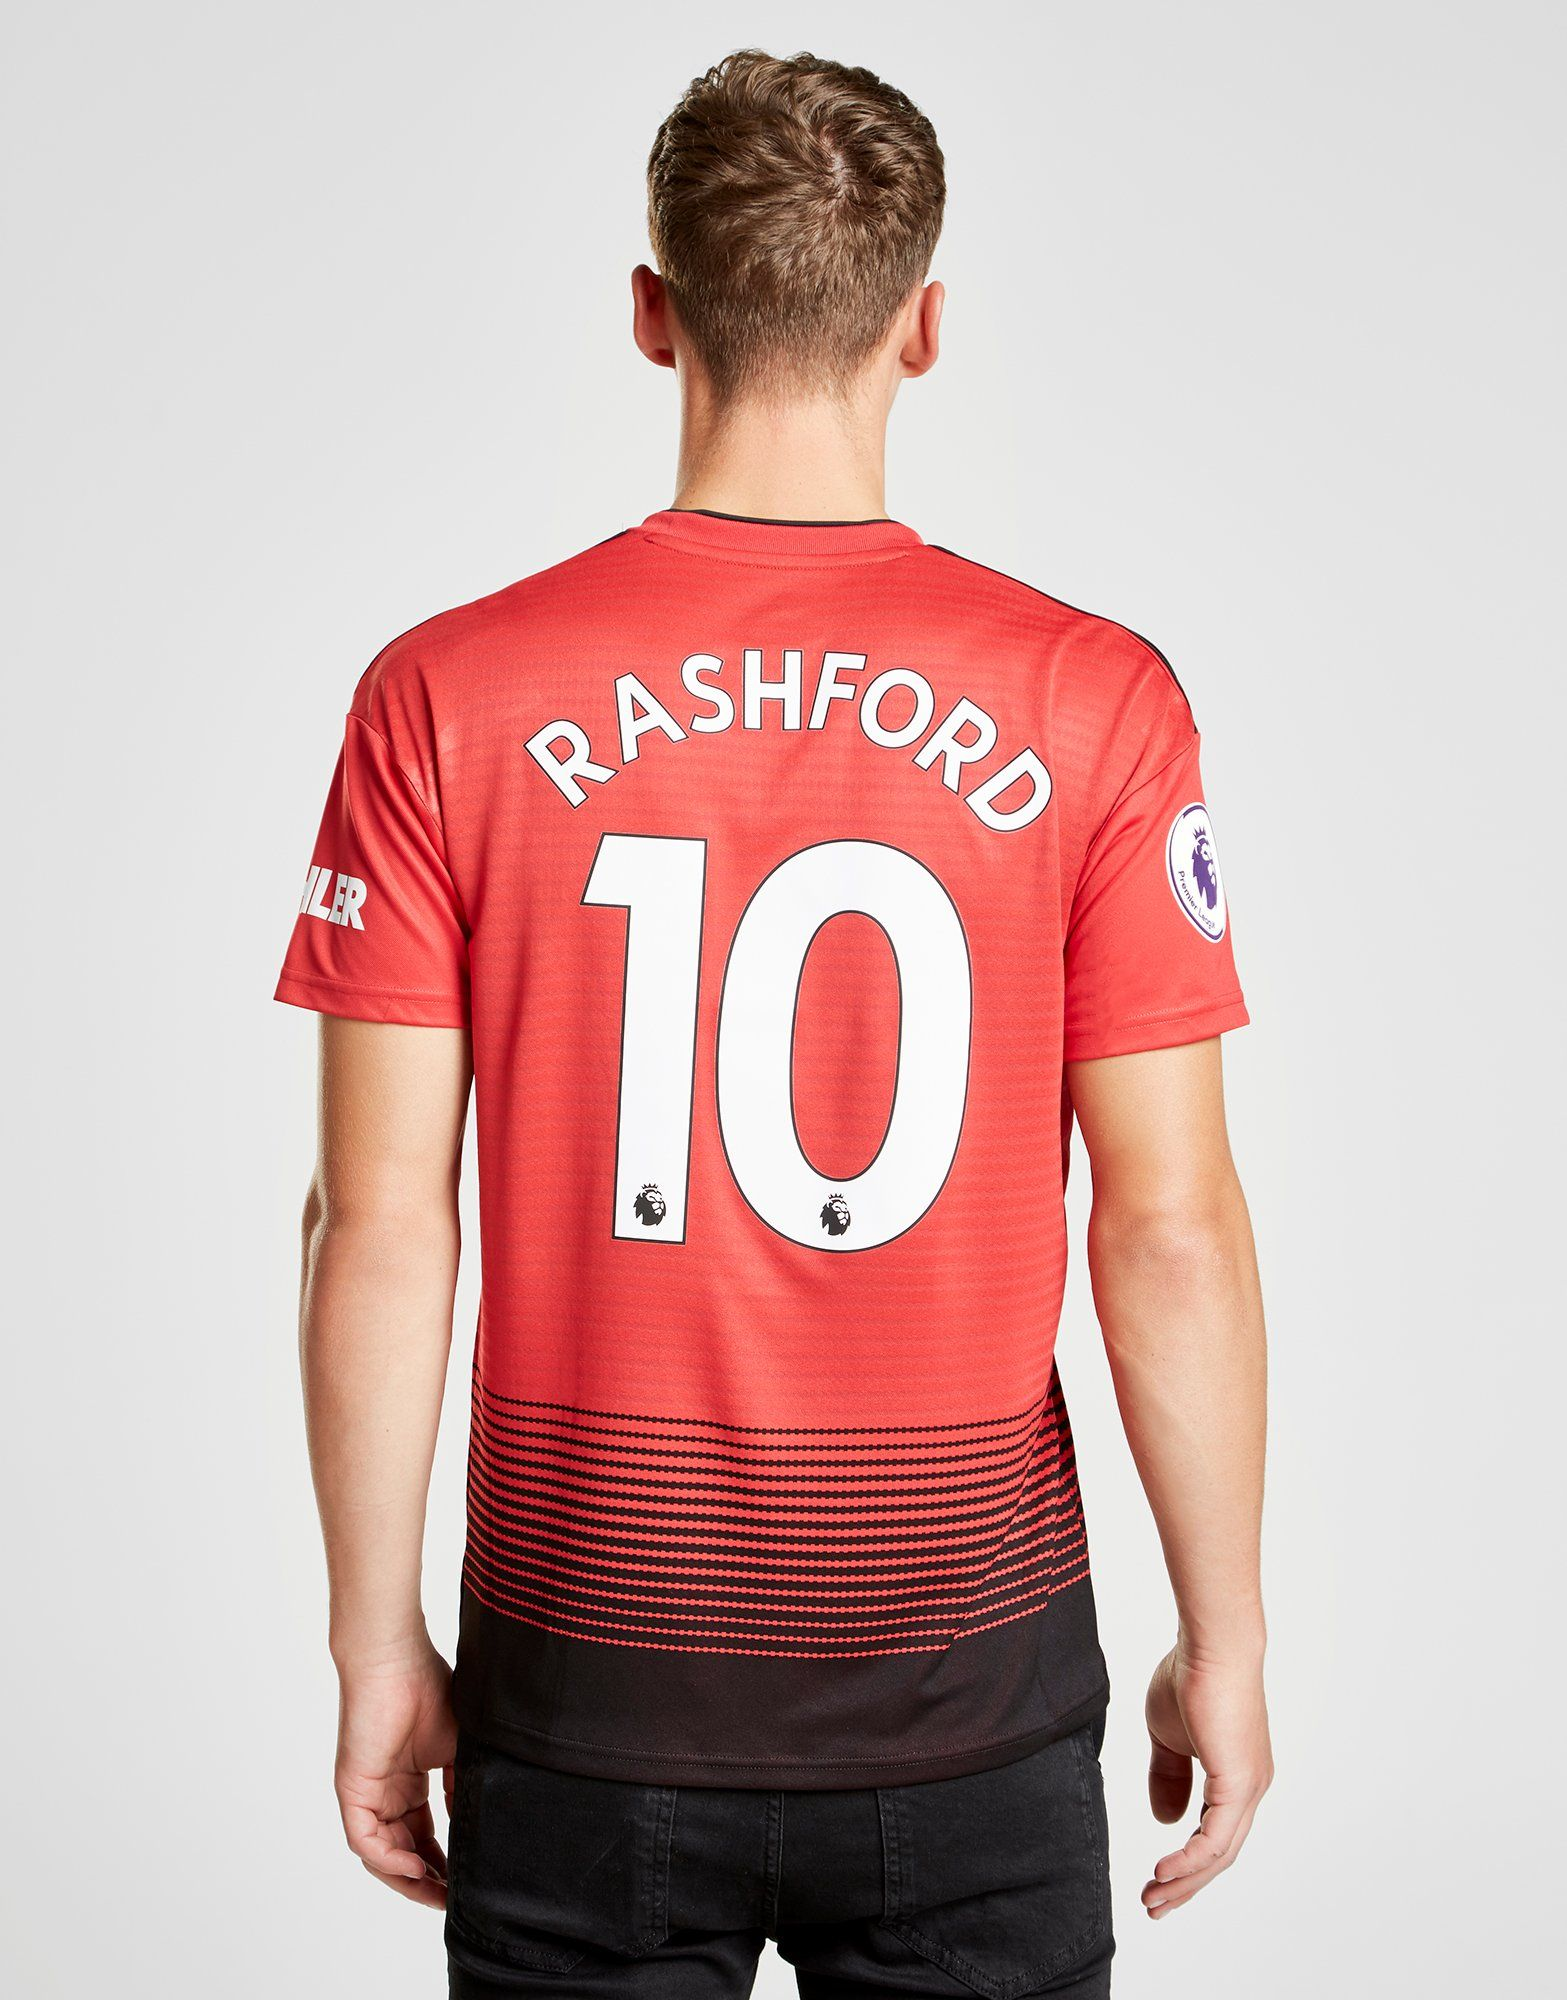 adidas Manchester United 2018/19 Rashford #10 Home Shirt